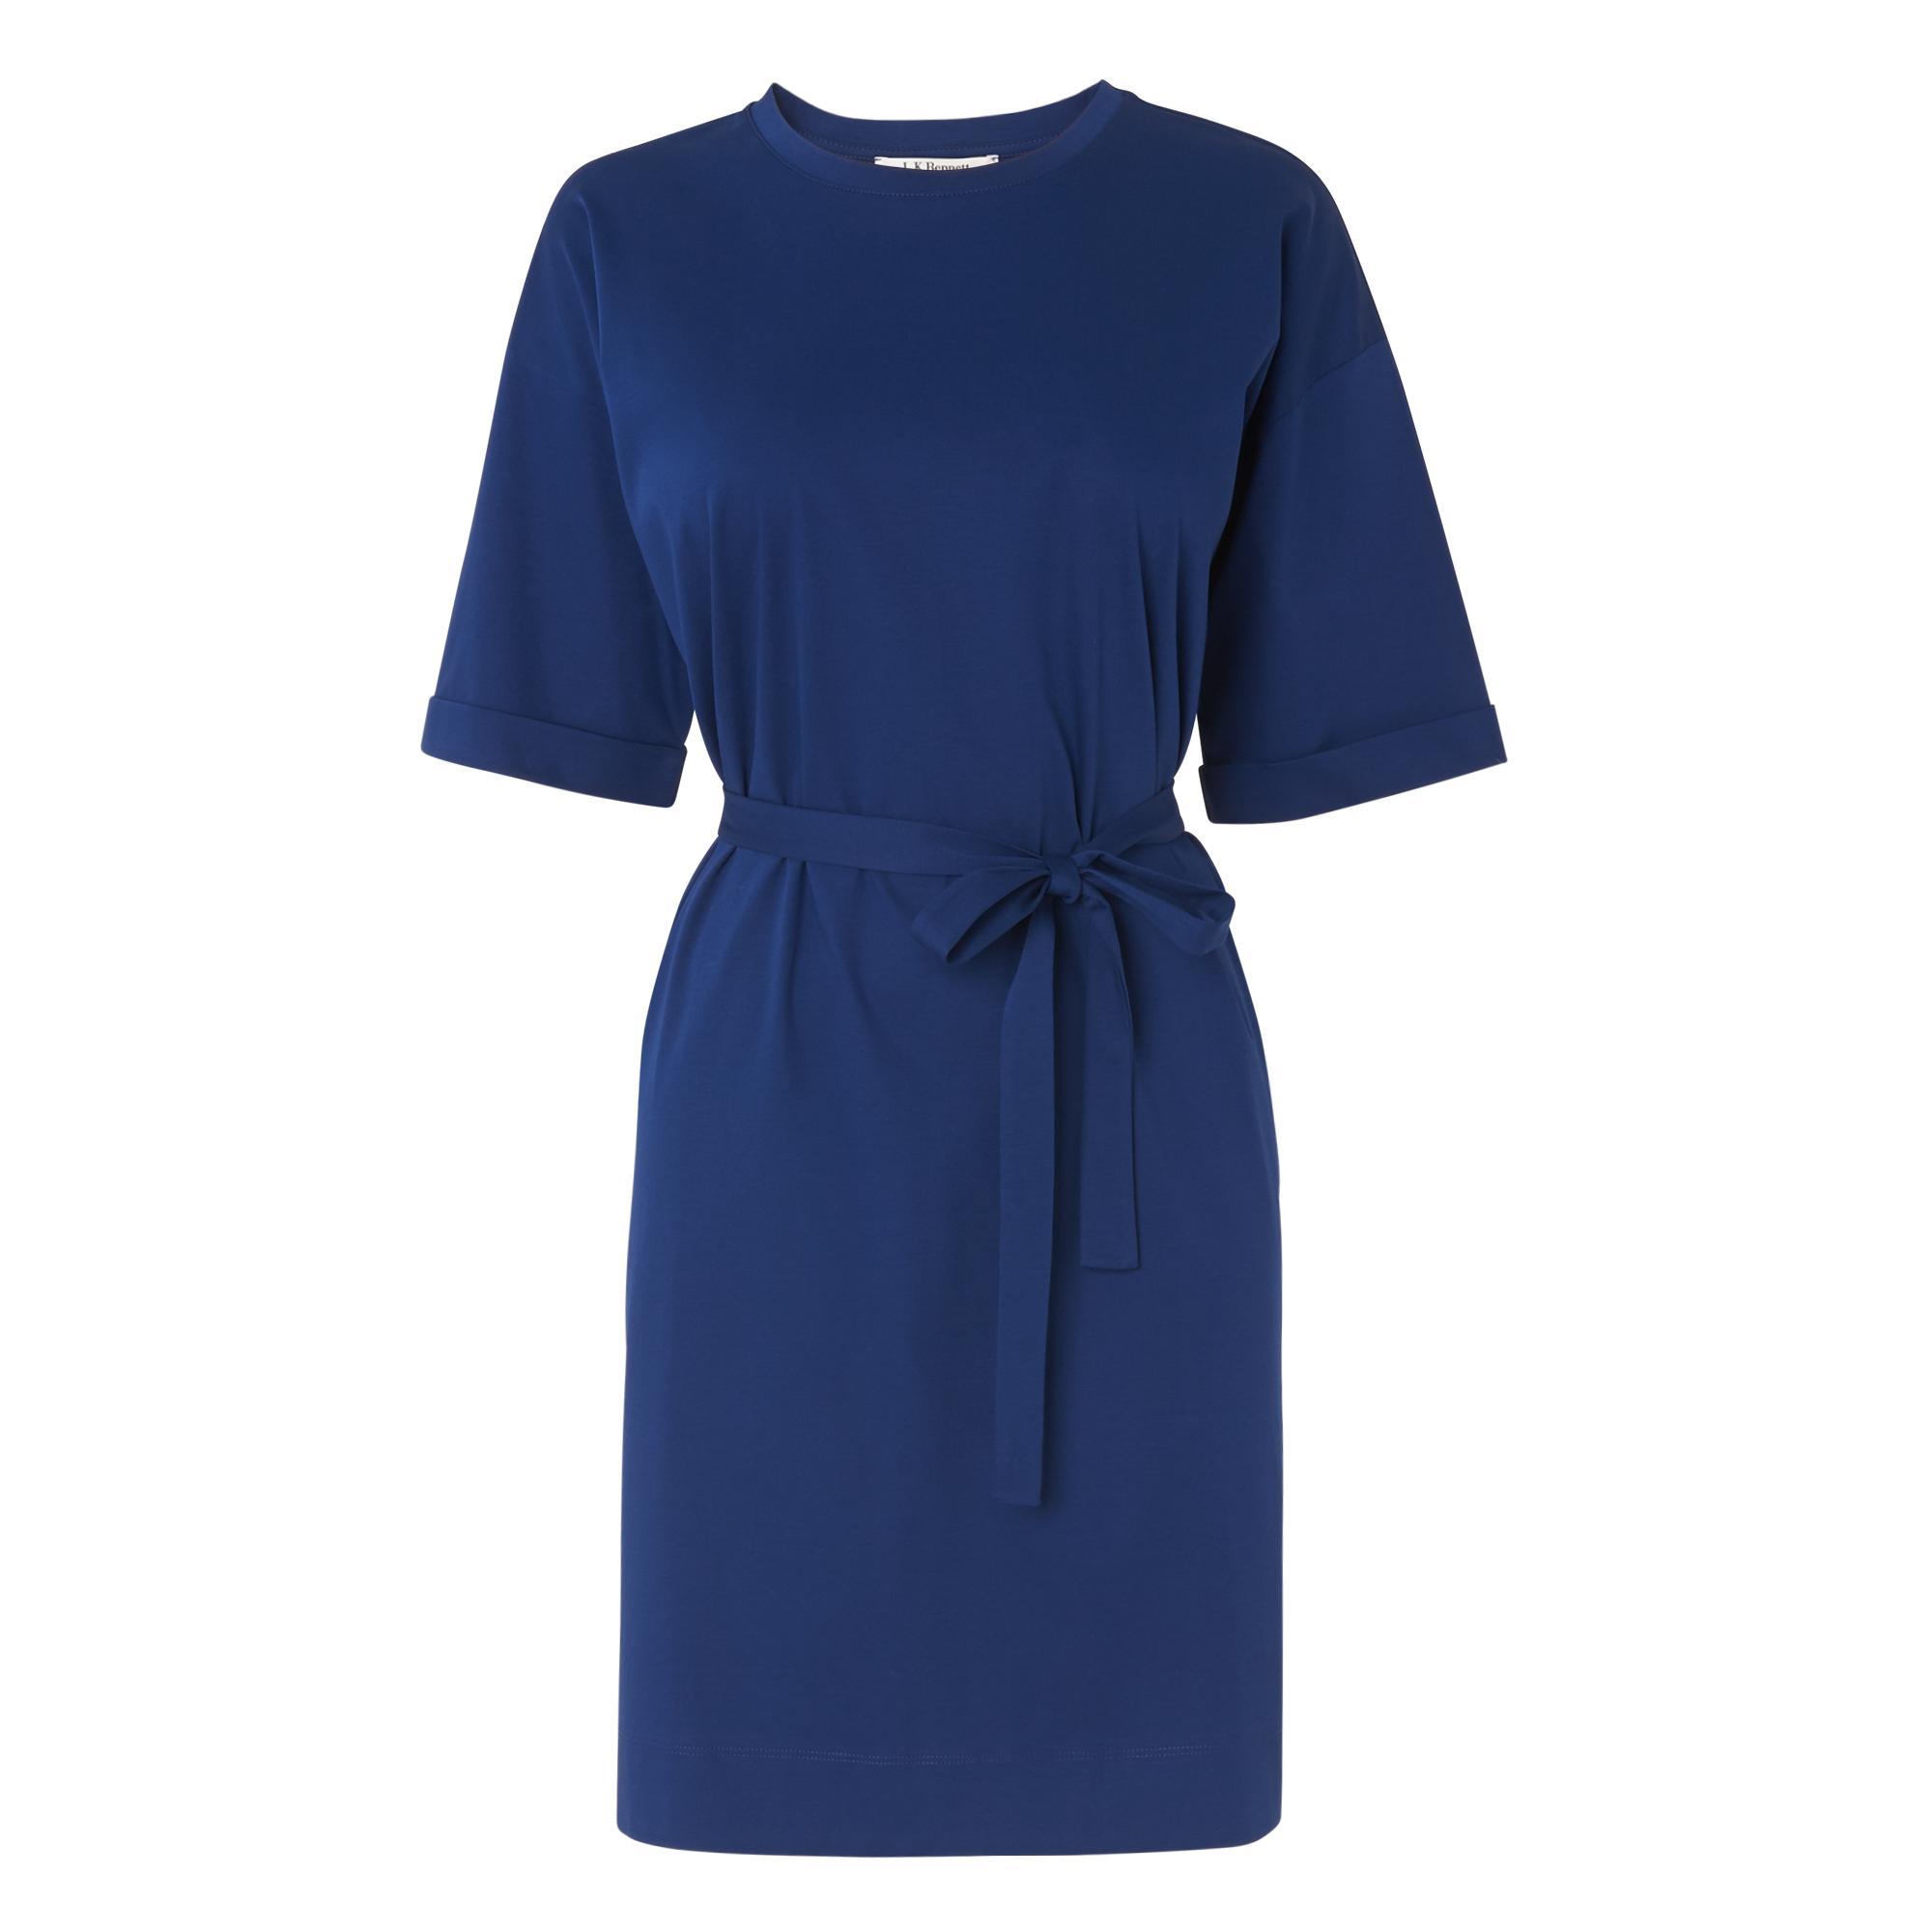 Adana Blue Jersey Dress